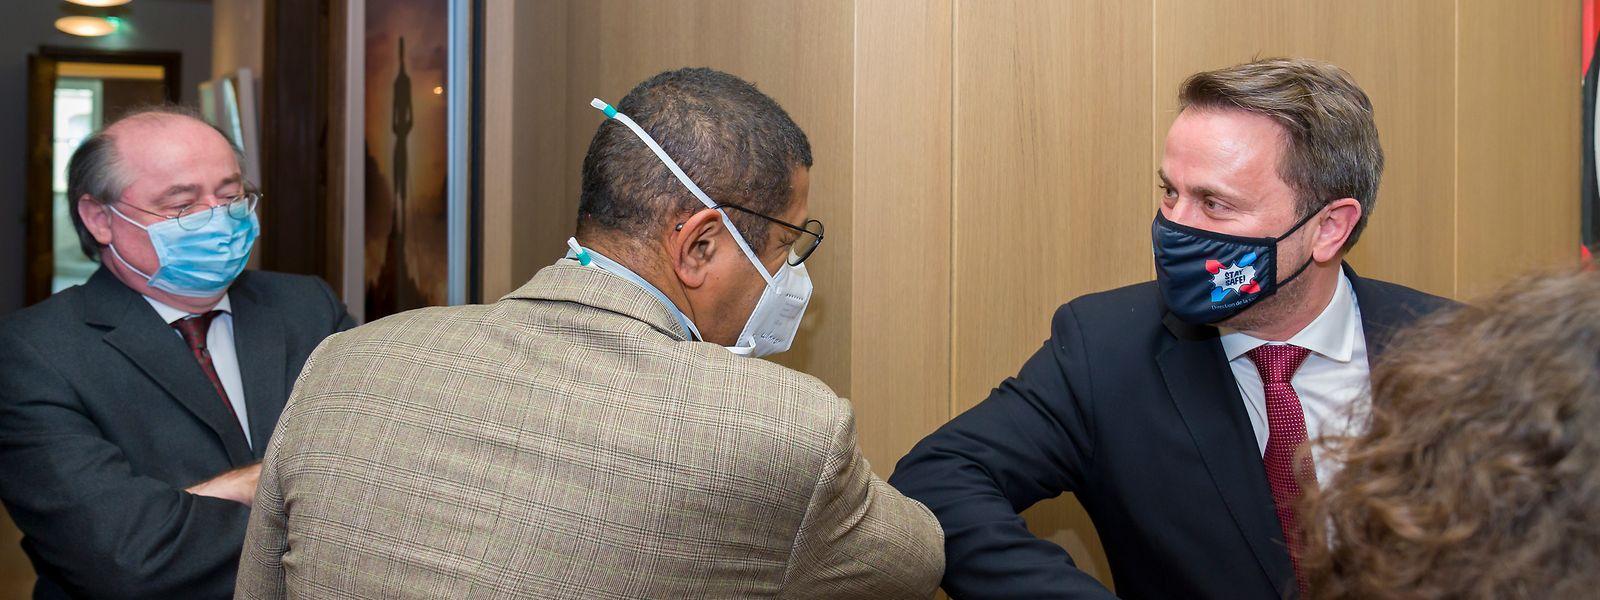 António Gamito, embaixador de Portugal no Luxemburgo, o médico Samuel Luyasu e o primeiro-ministro, Xavier Bettel.